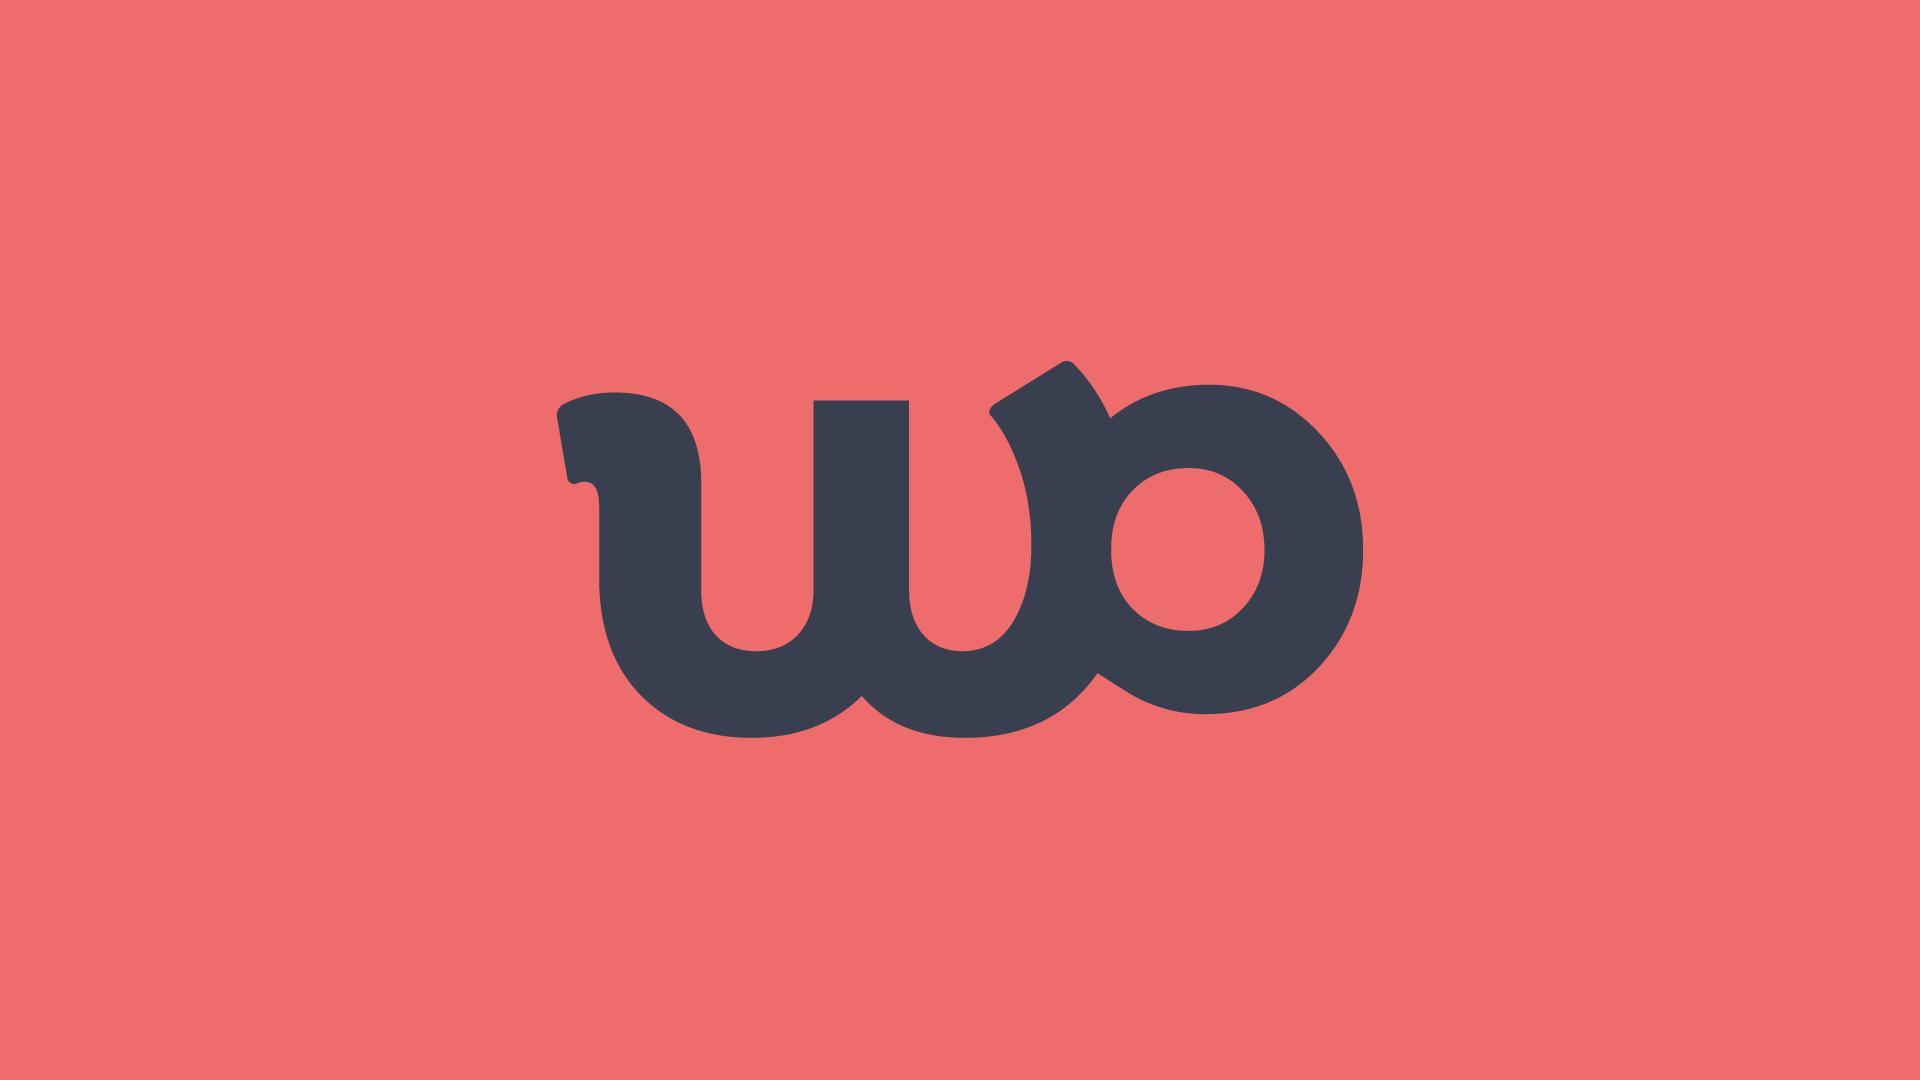 Woo Punch Logo